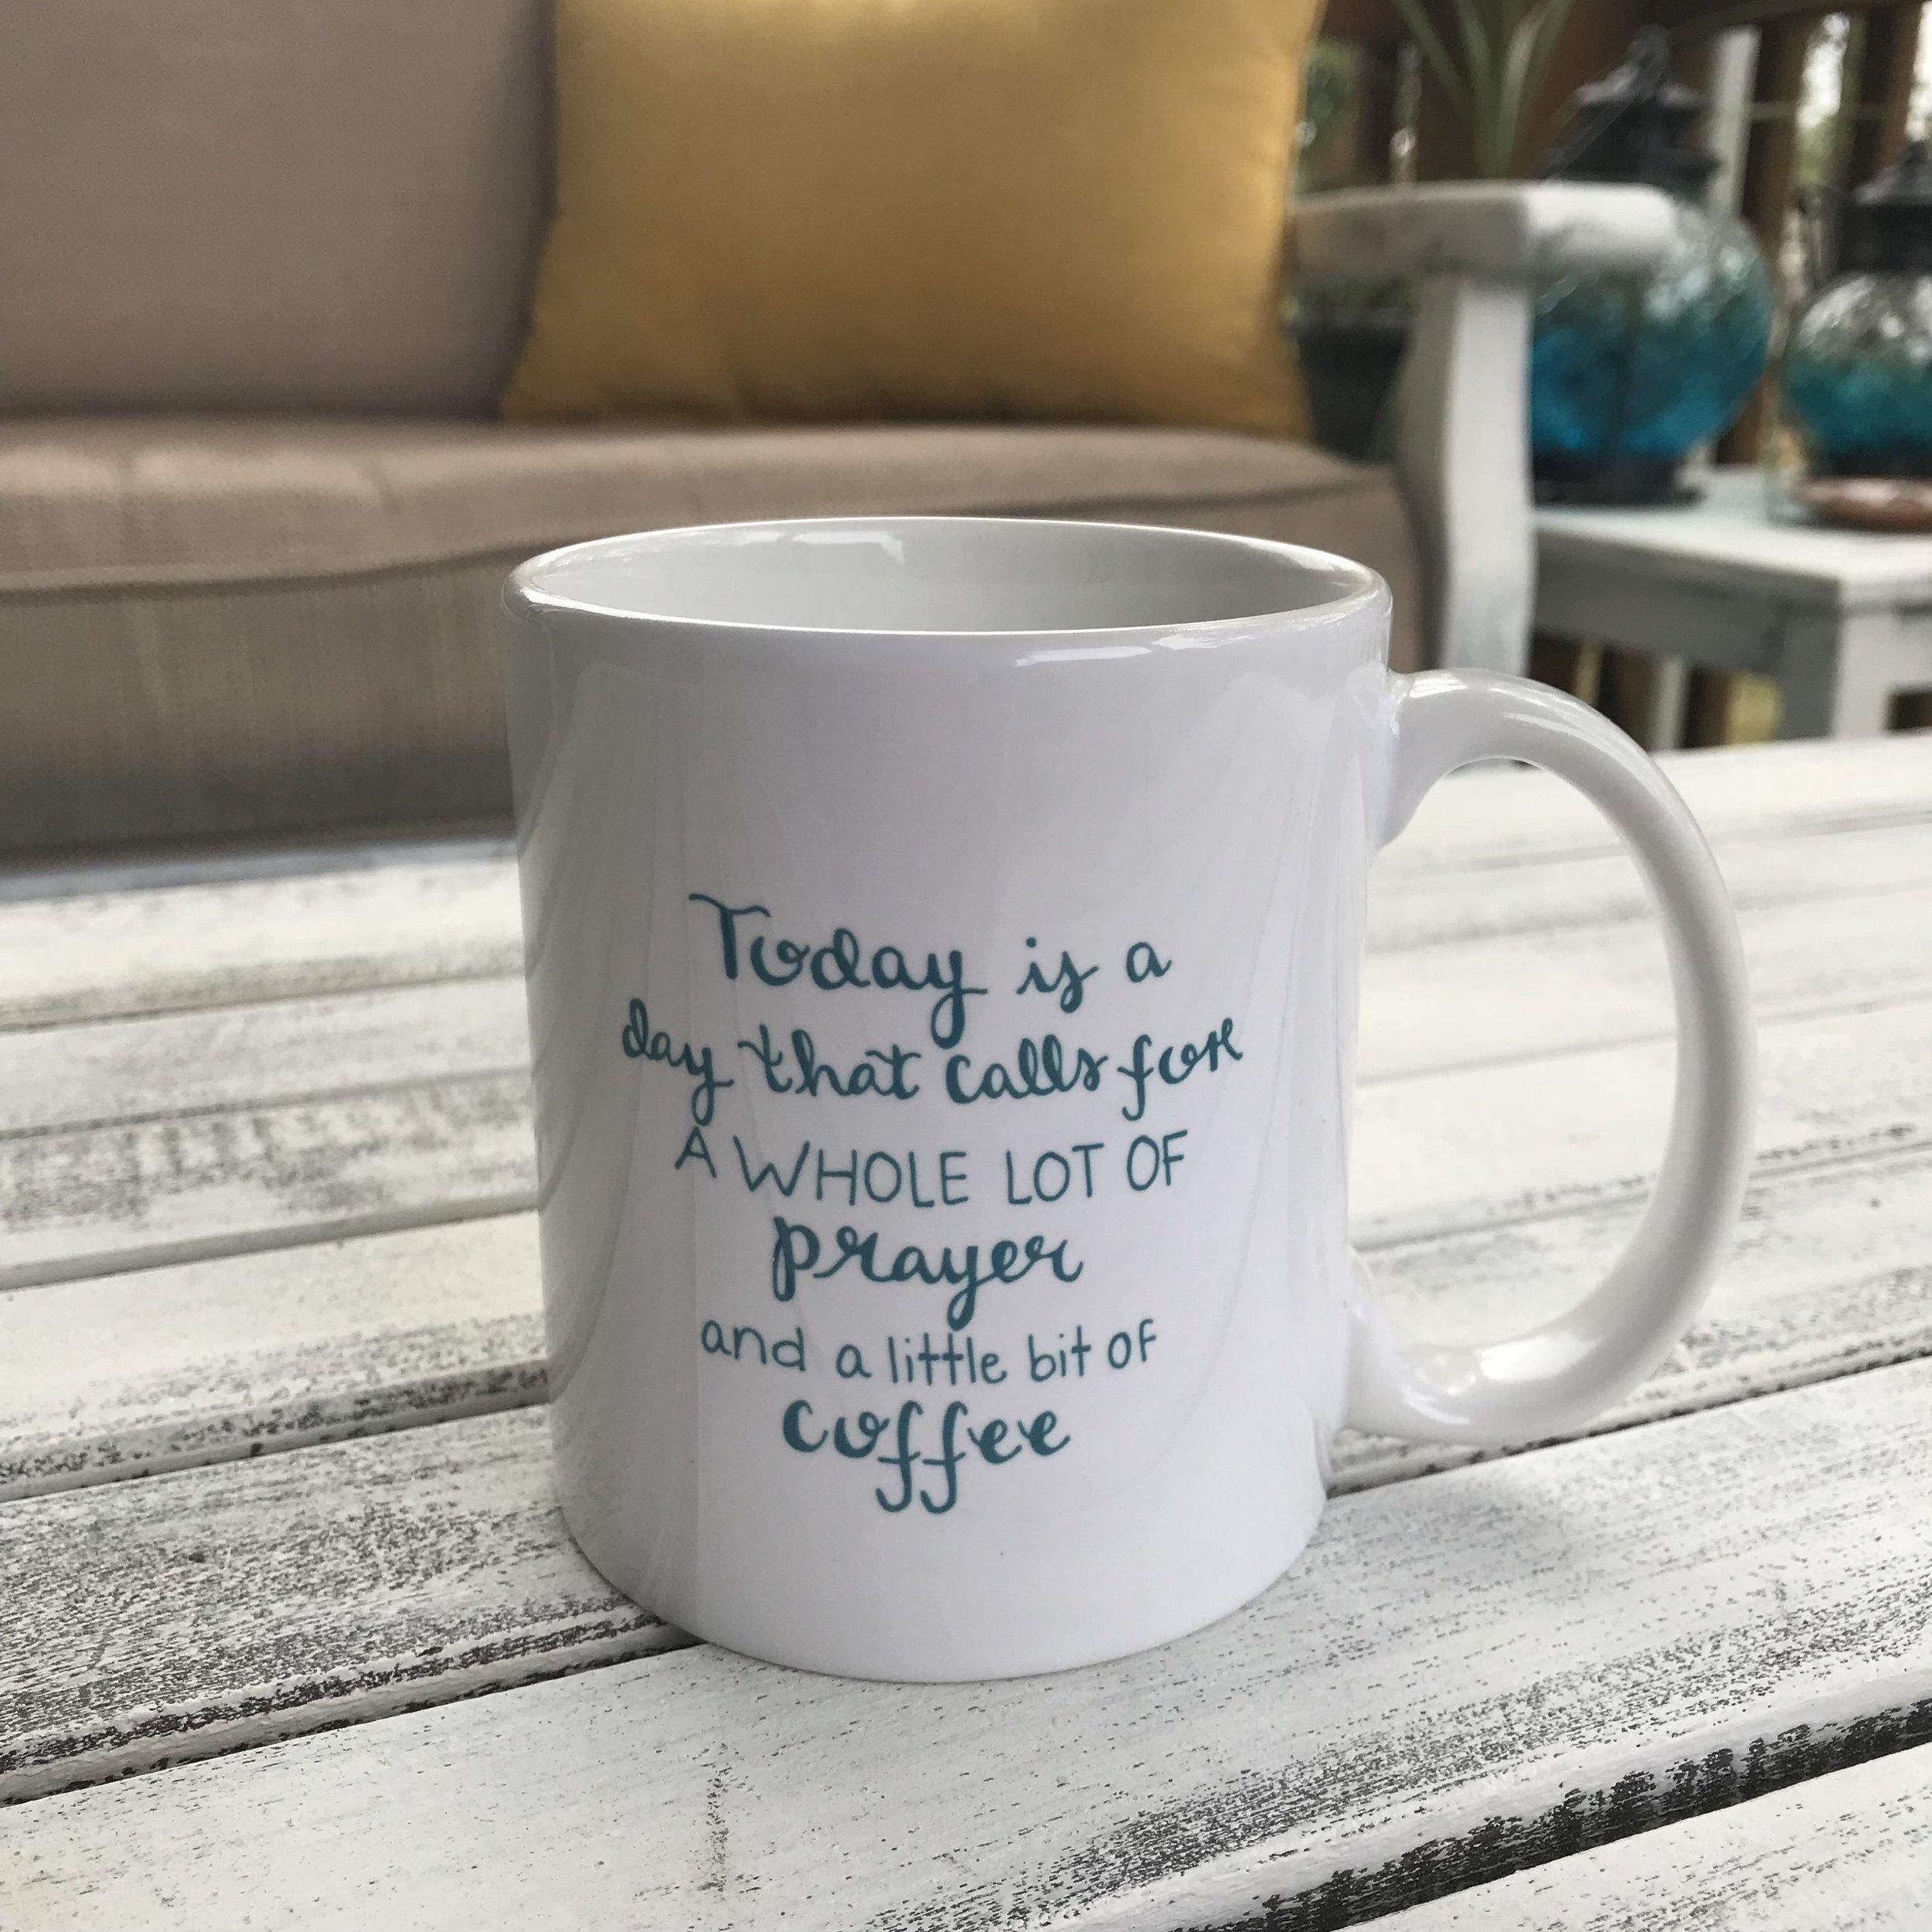 Prayer + Coffee Mug - Maya Palmer Designs